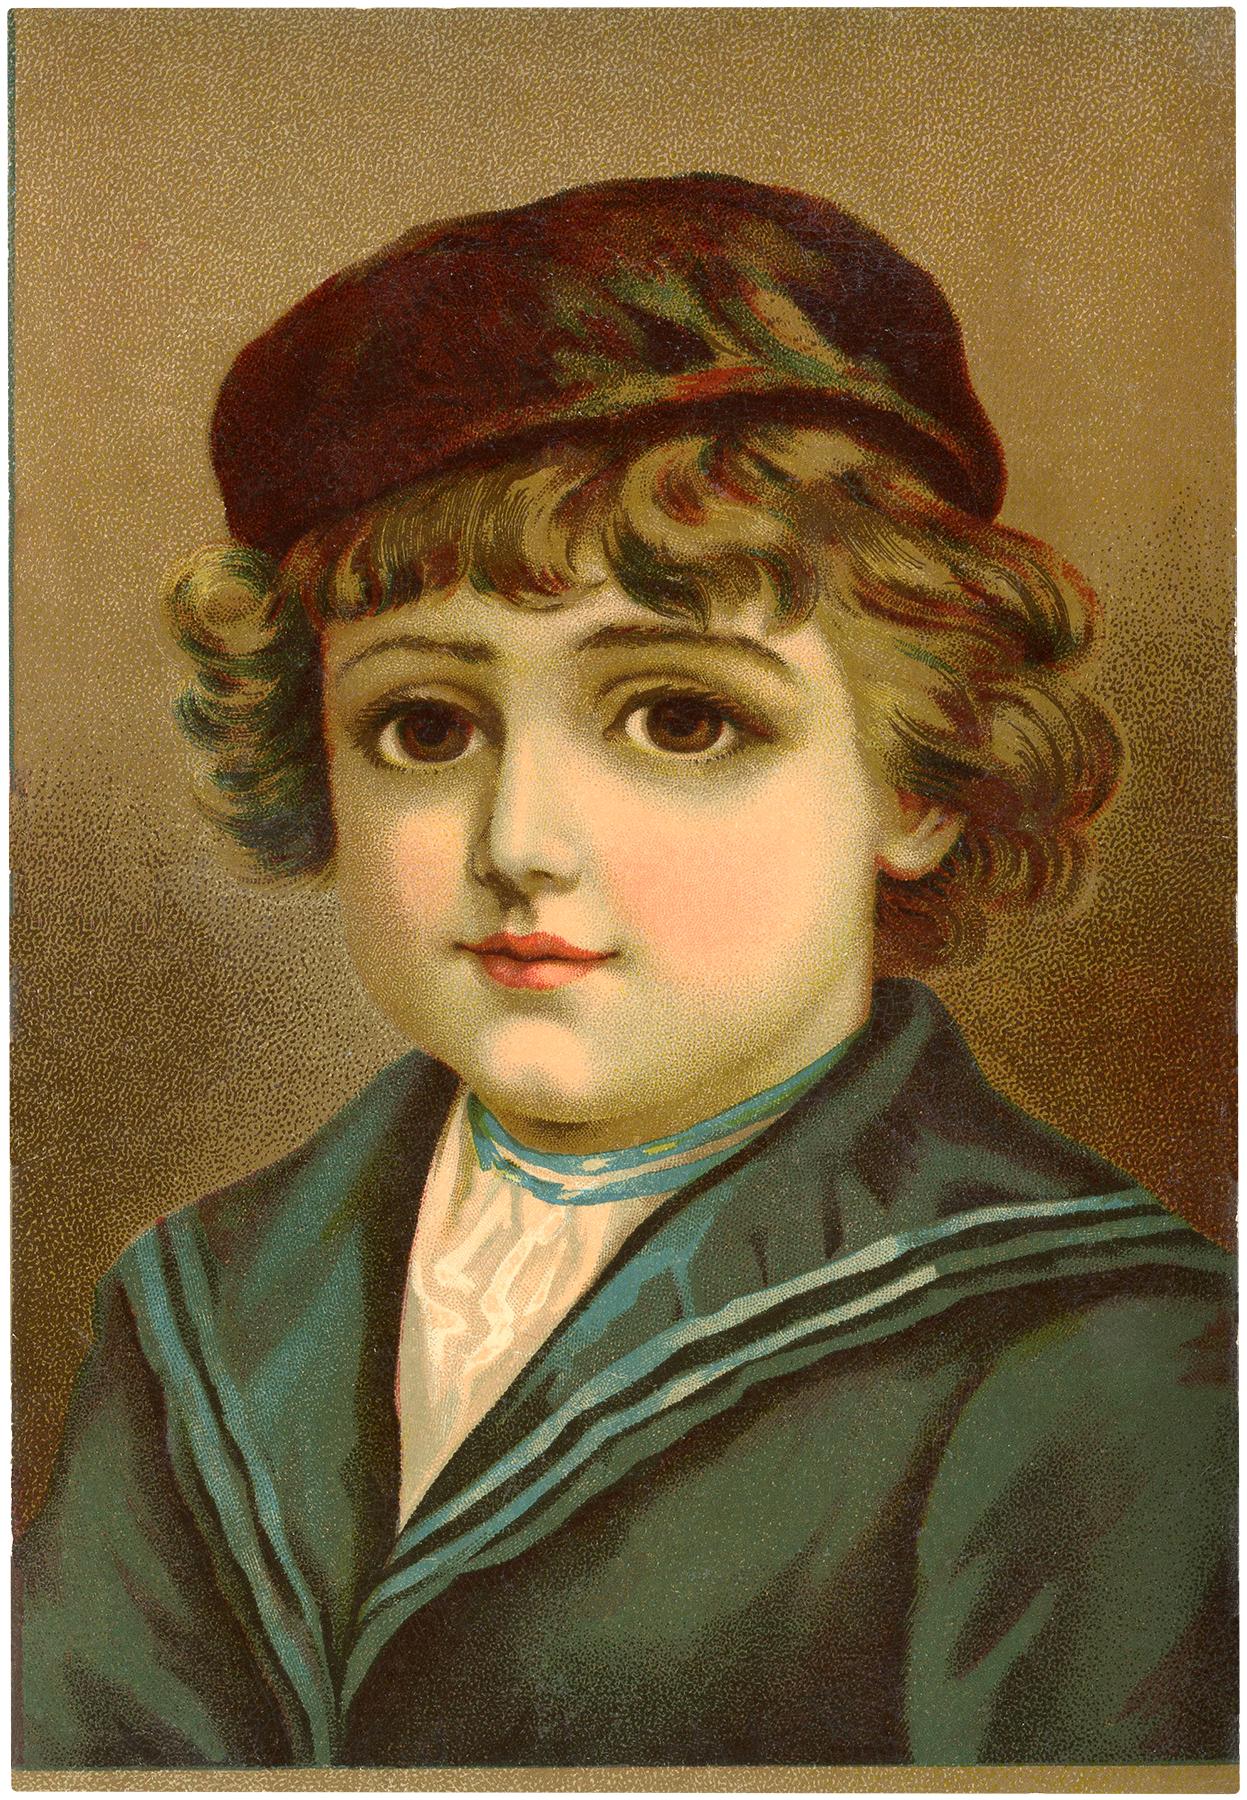 Big Eyed Victorian Boy Image